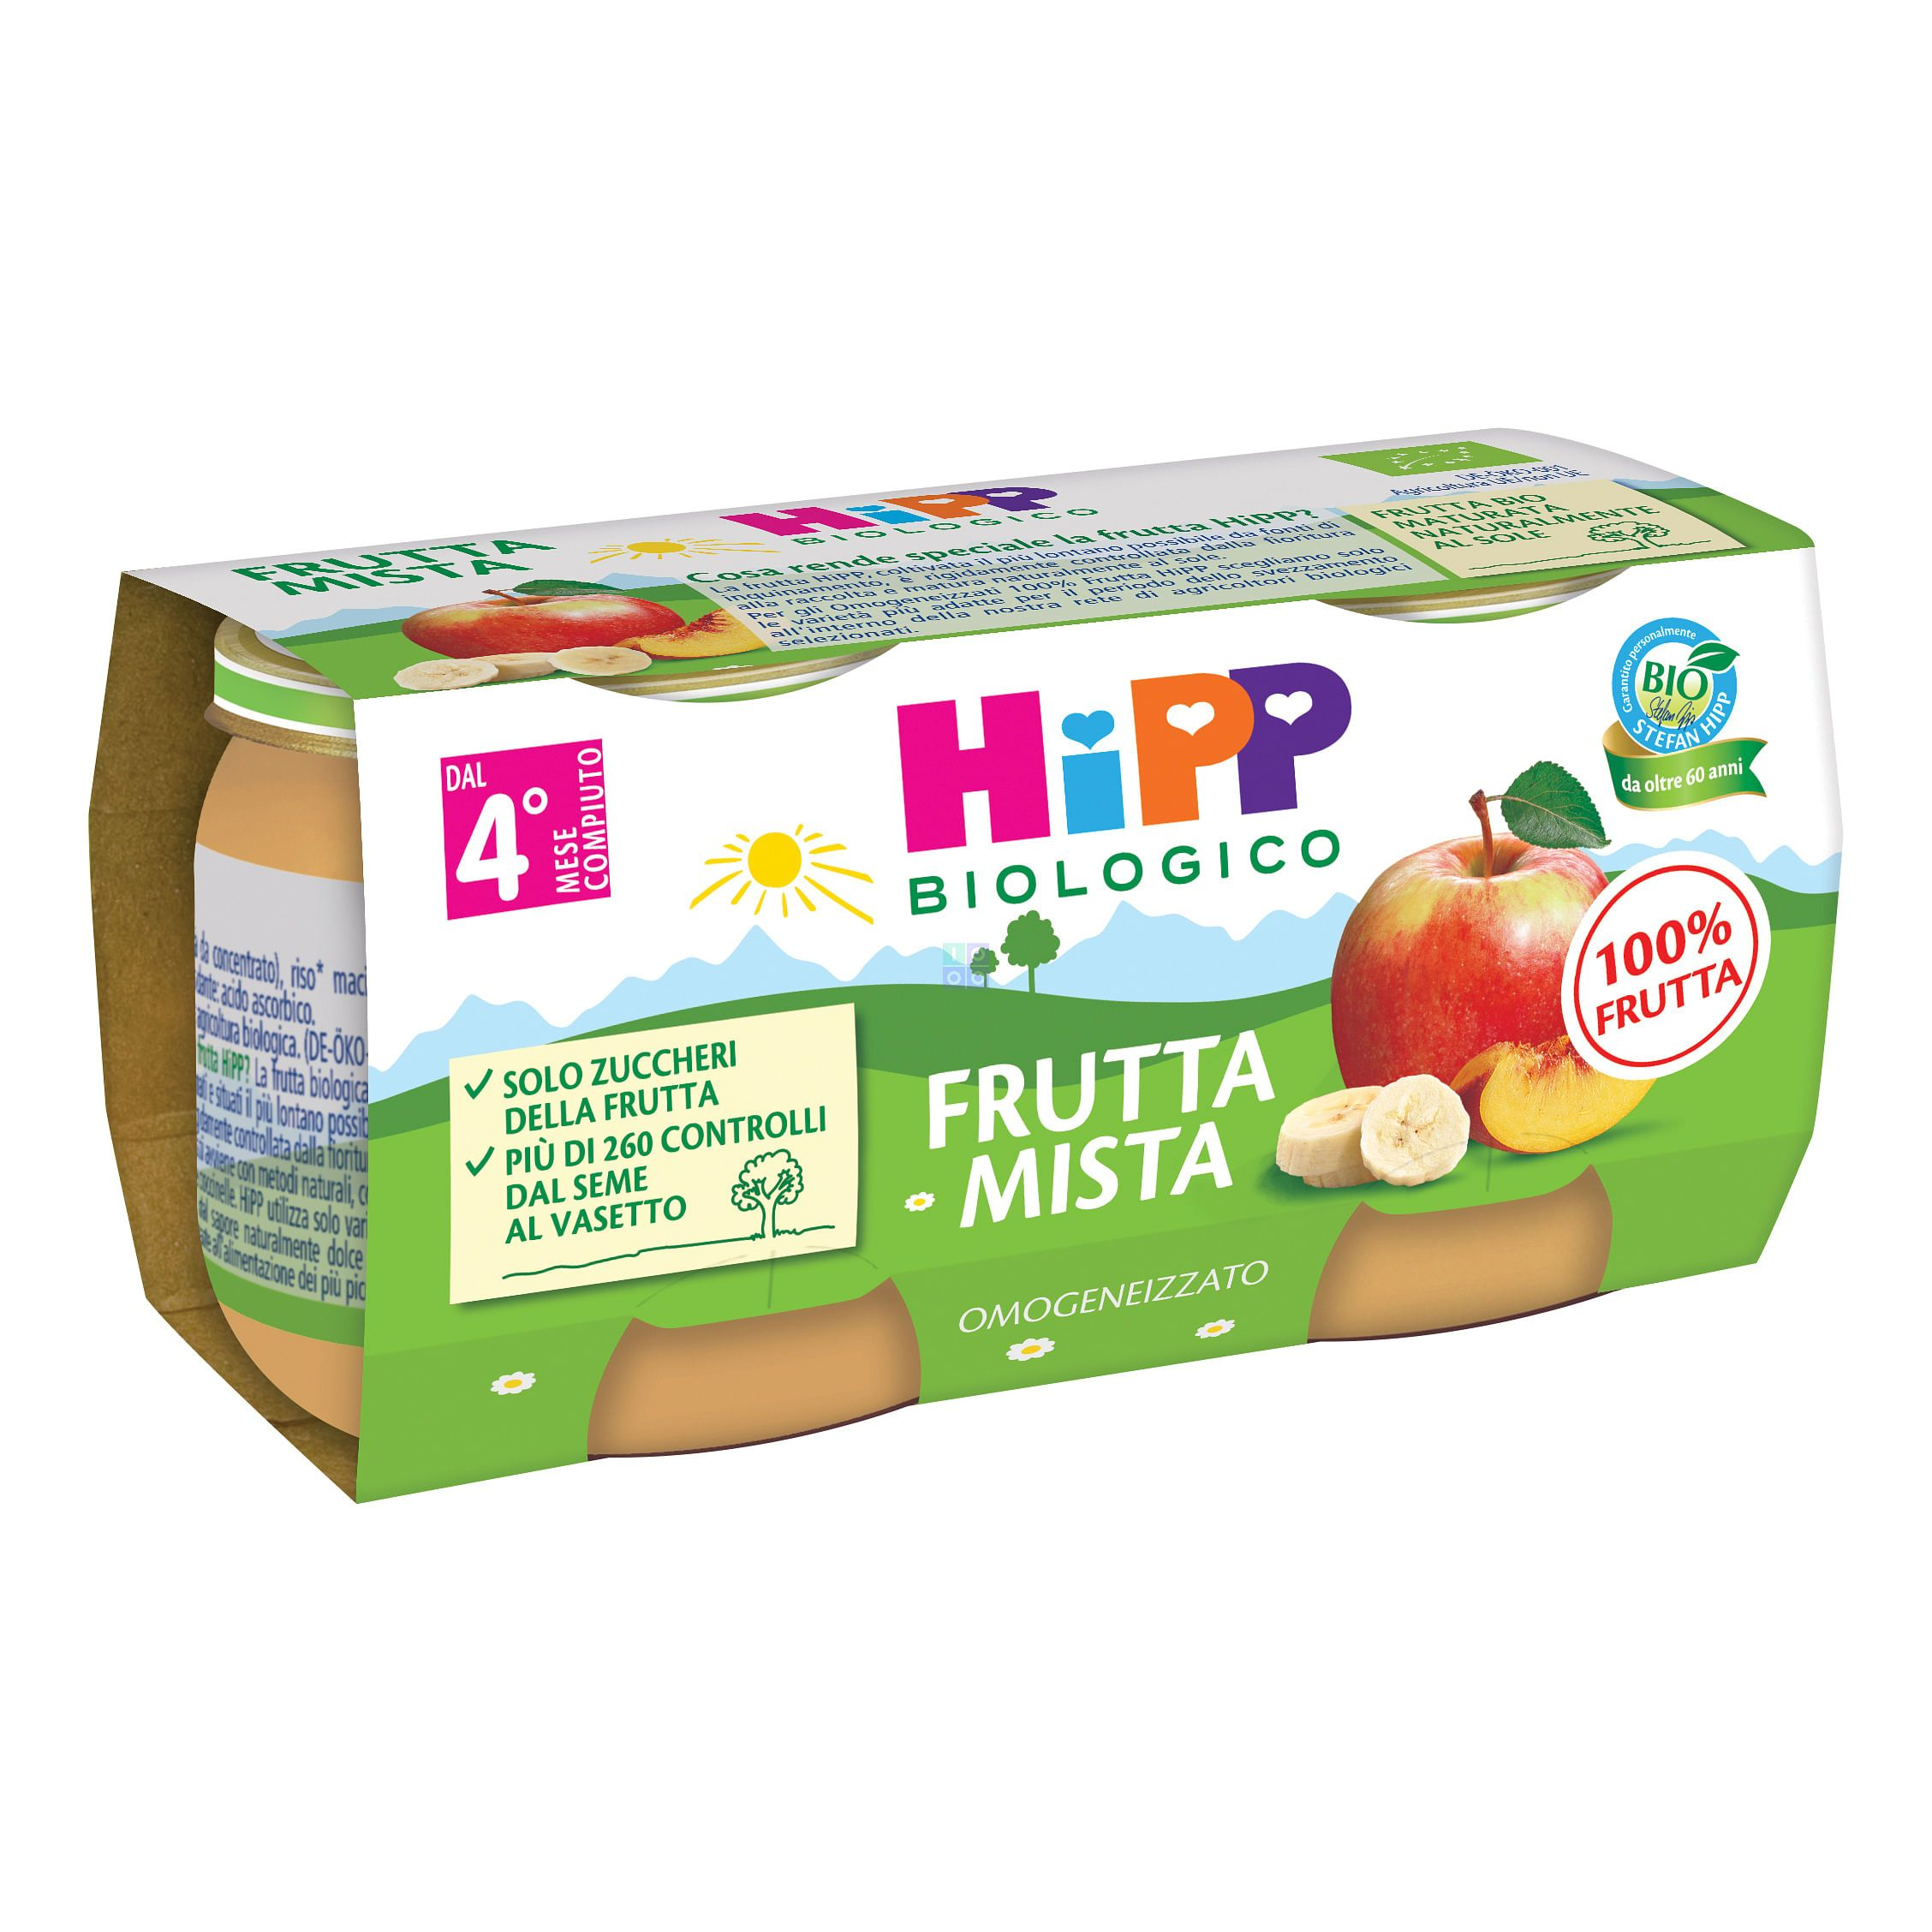 HIPP OMOGENIZZATO FRUTTA MISTA 2X80G